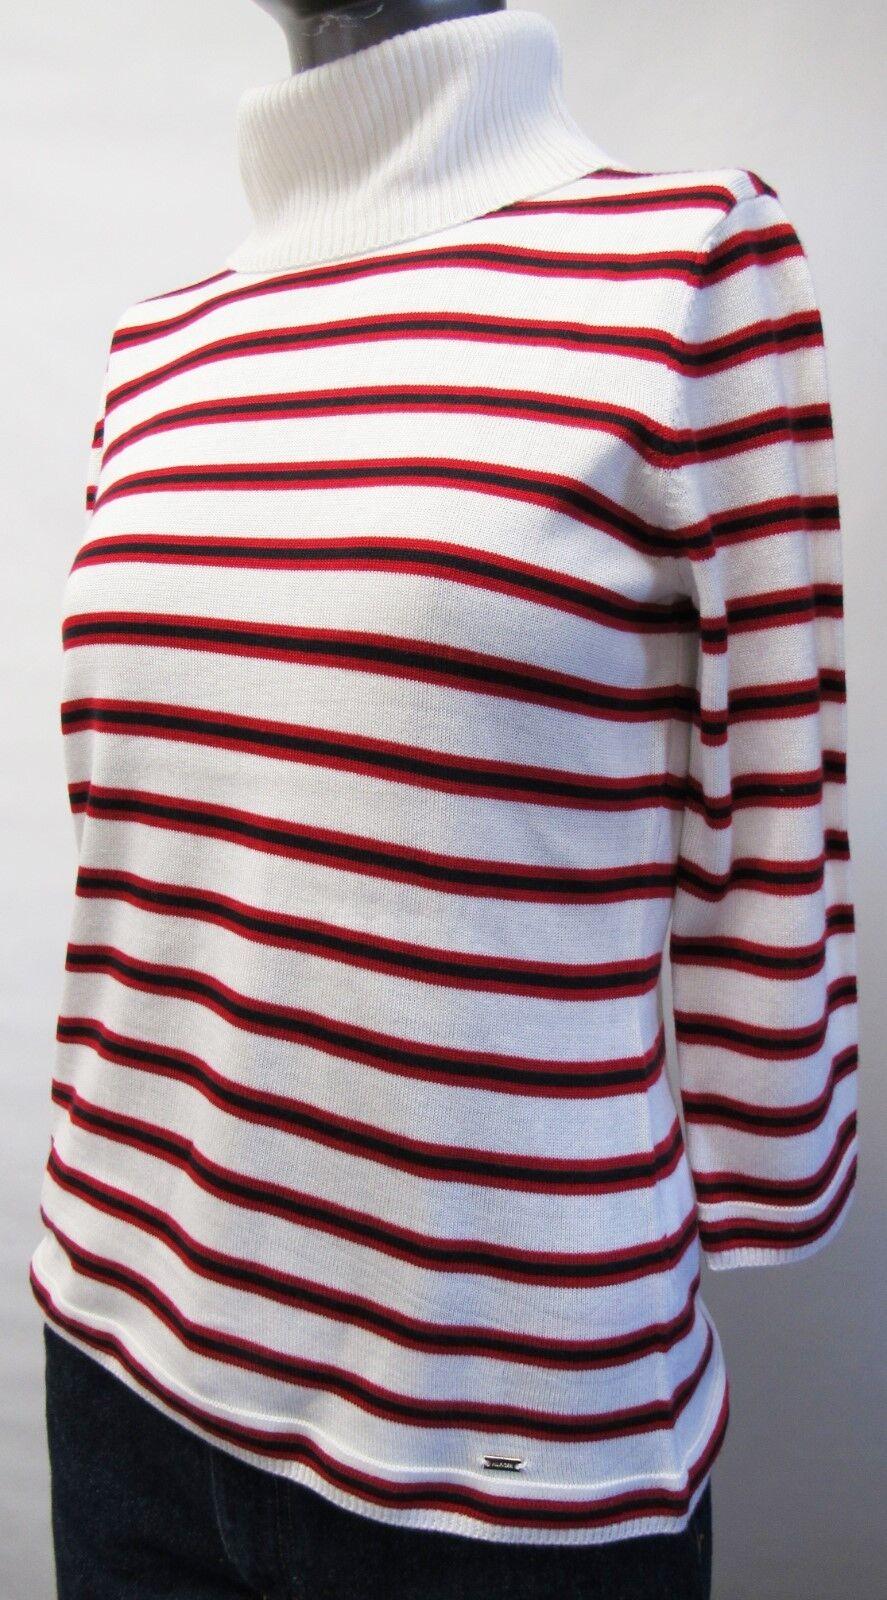 D170 Sleepwear Uomo's Summer Night Clothing Short Sleeve+Pants Sleepwear D170 Pajama Cotton Q 490fb8